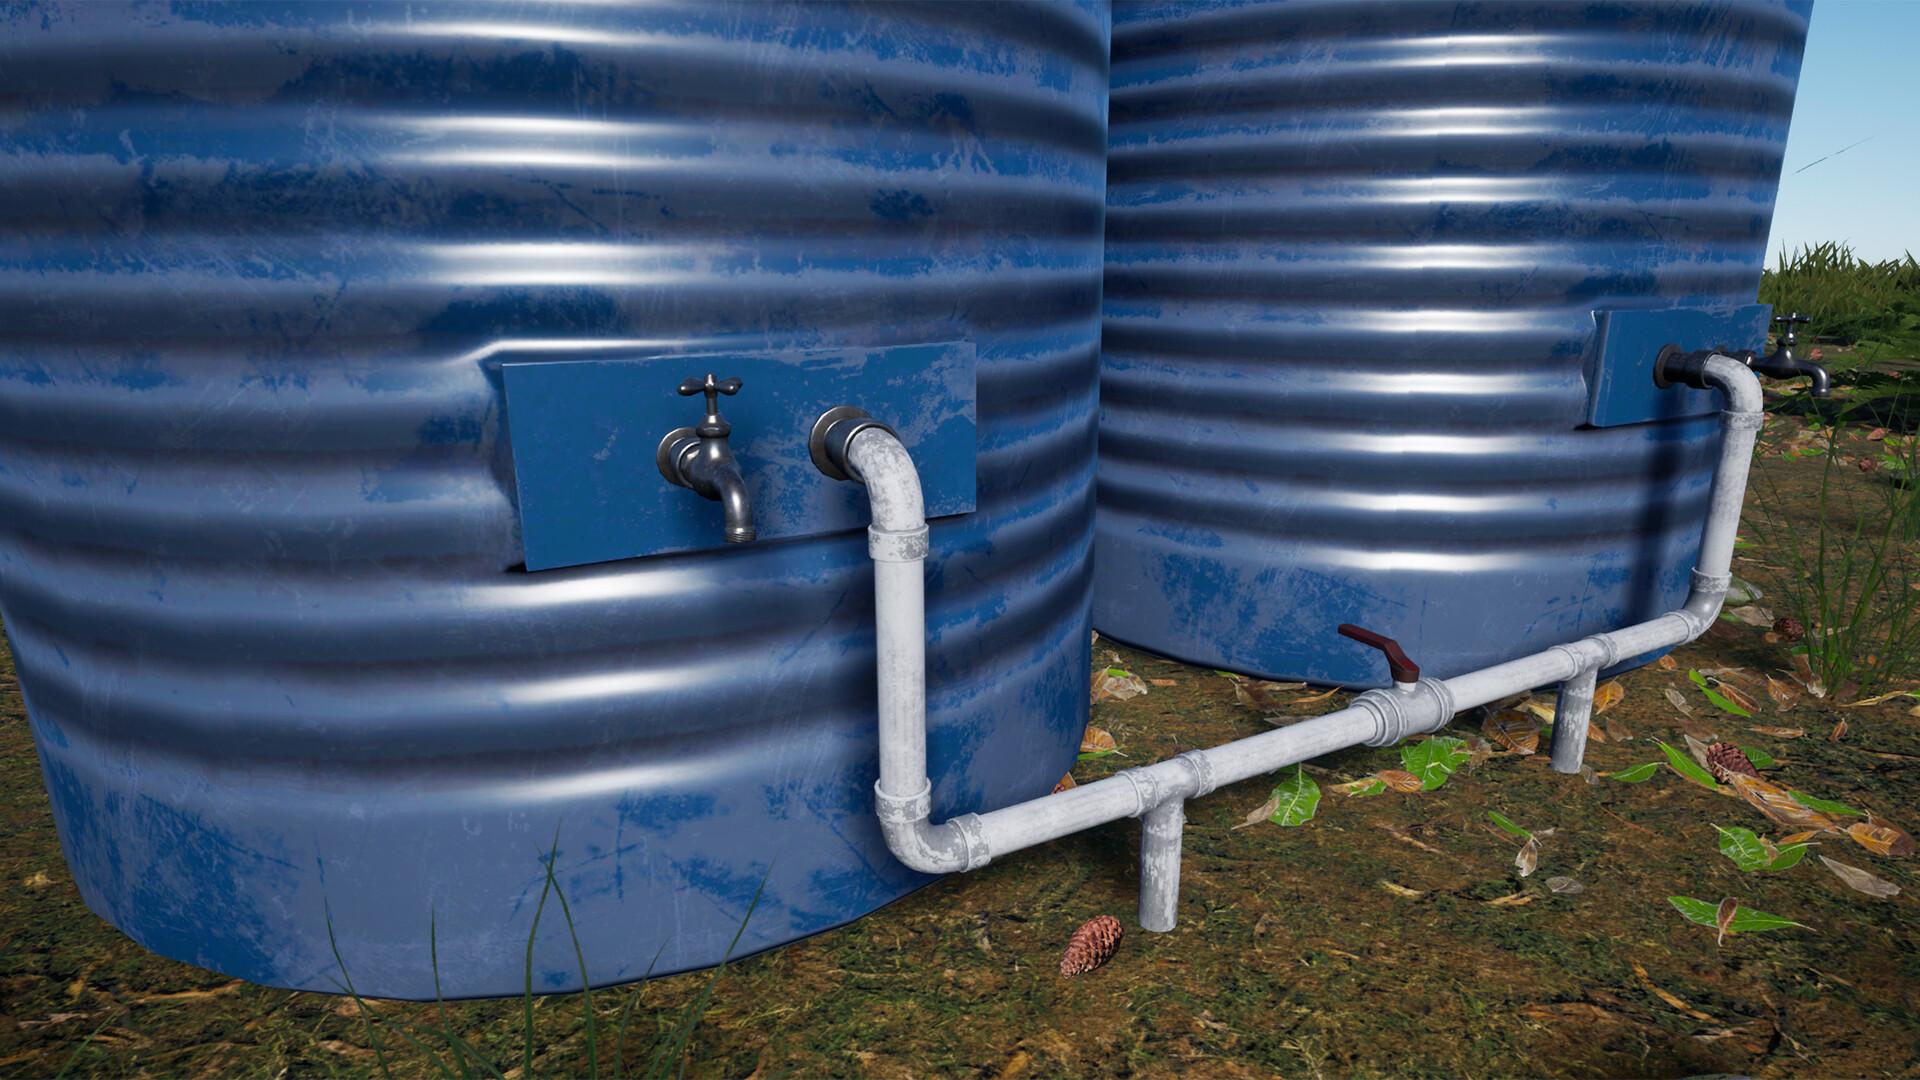 Carl kent water tank 2